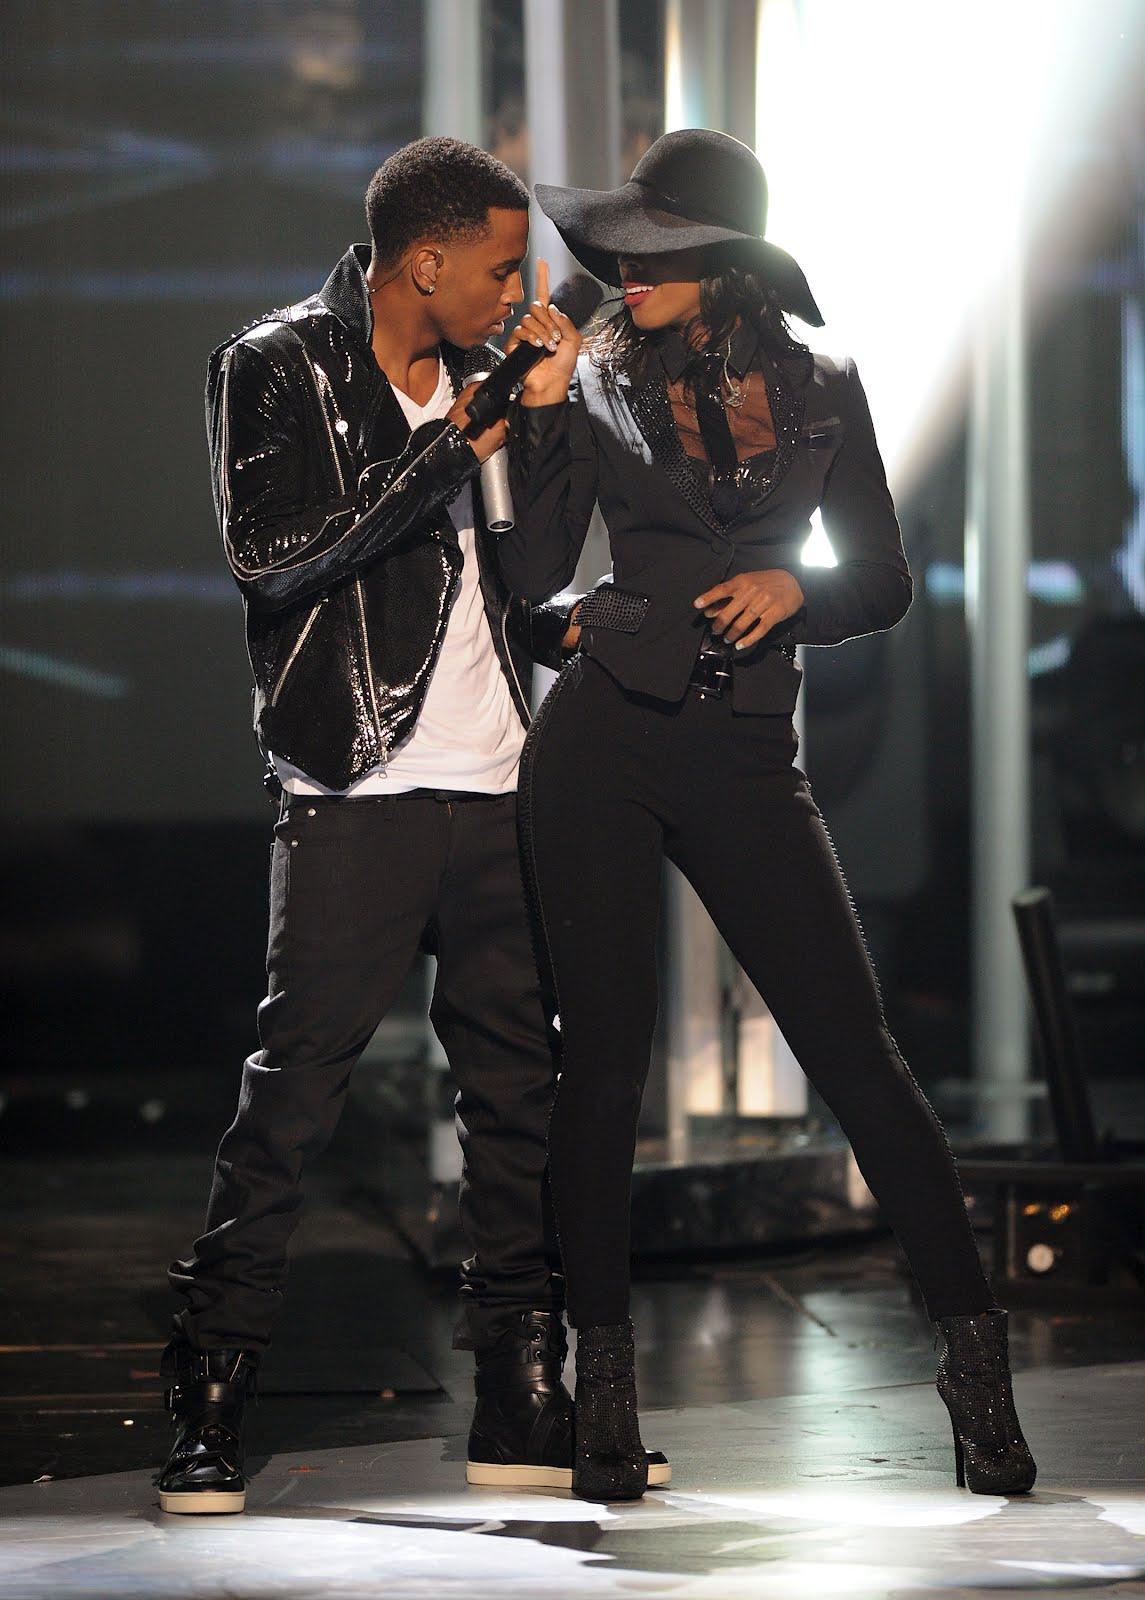 WE MAKE MUSIC SHOW: Kelly Rowland & Trey Songz Enjoying ...